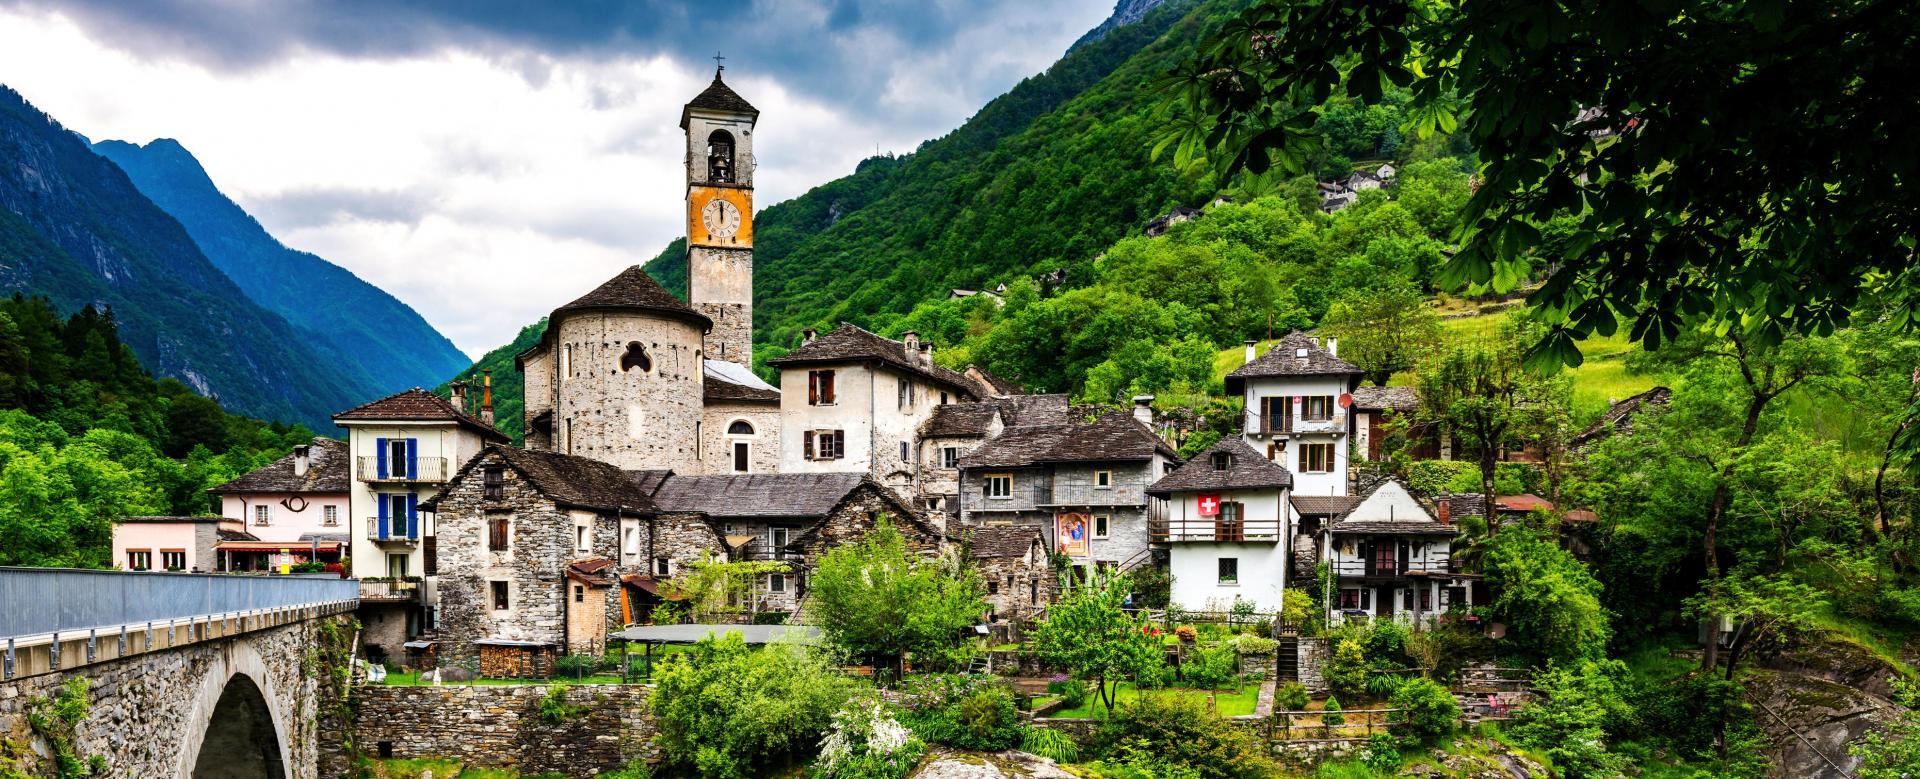 Voyage à pied : Monti e valli du tessin